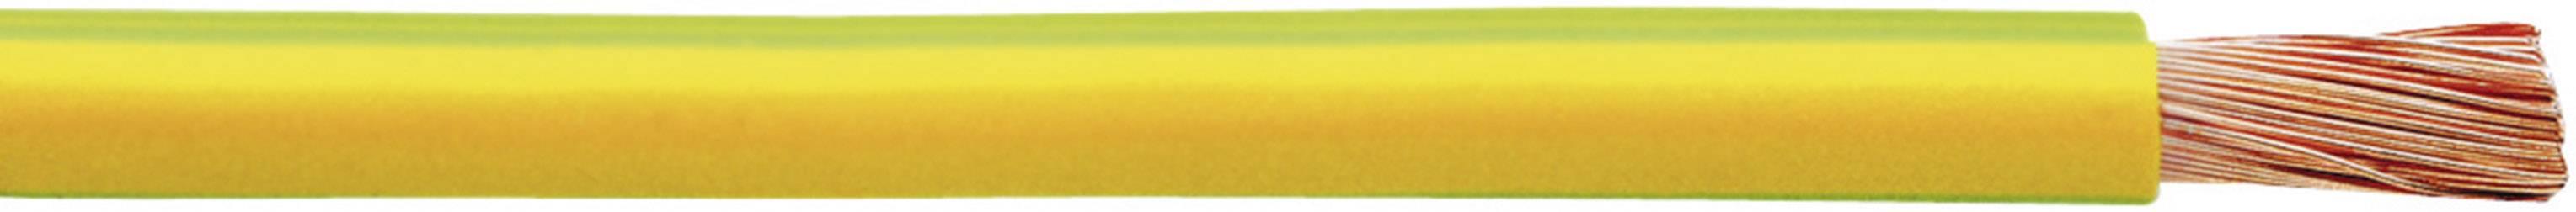 Pletenica H07V-K 1 x 4 mm, zelena-rumena Faber Kabel 040066 100 m